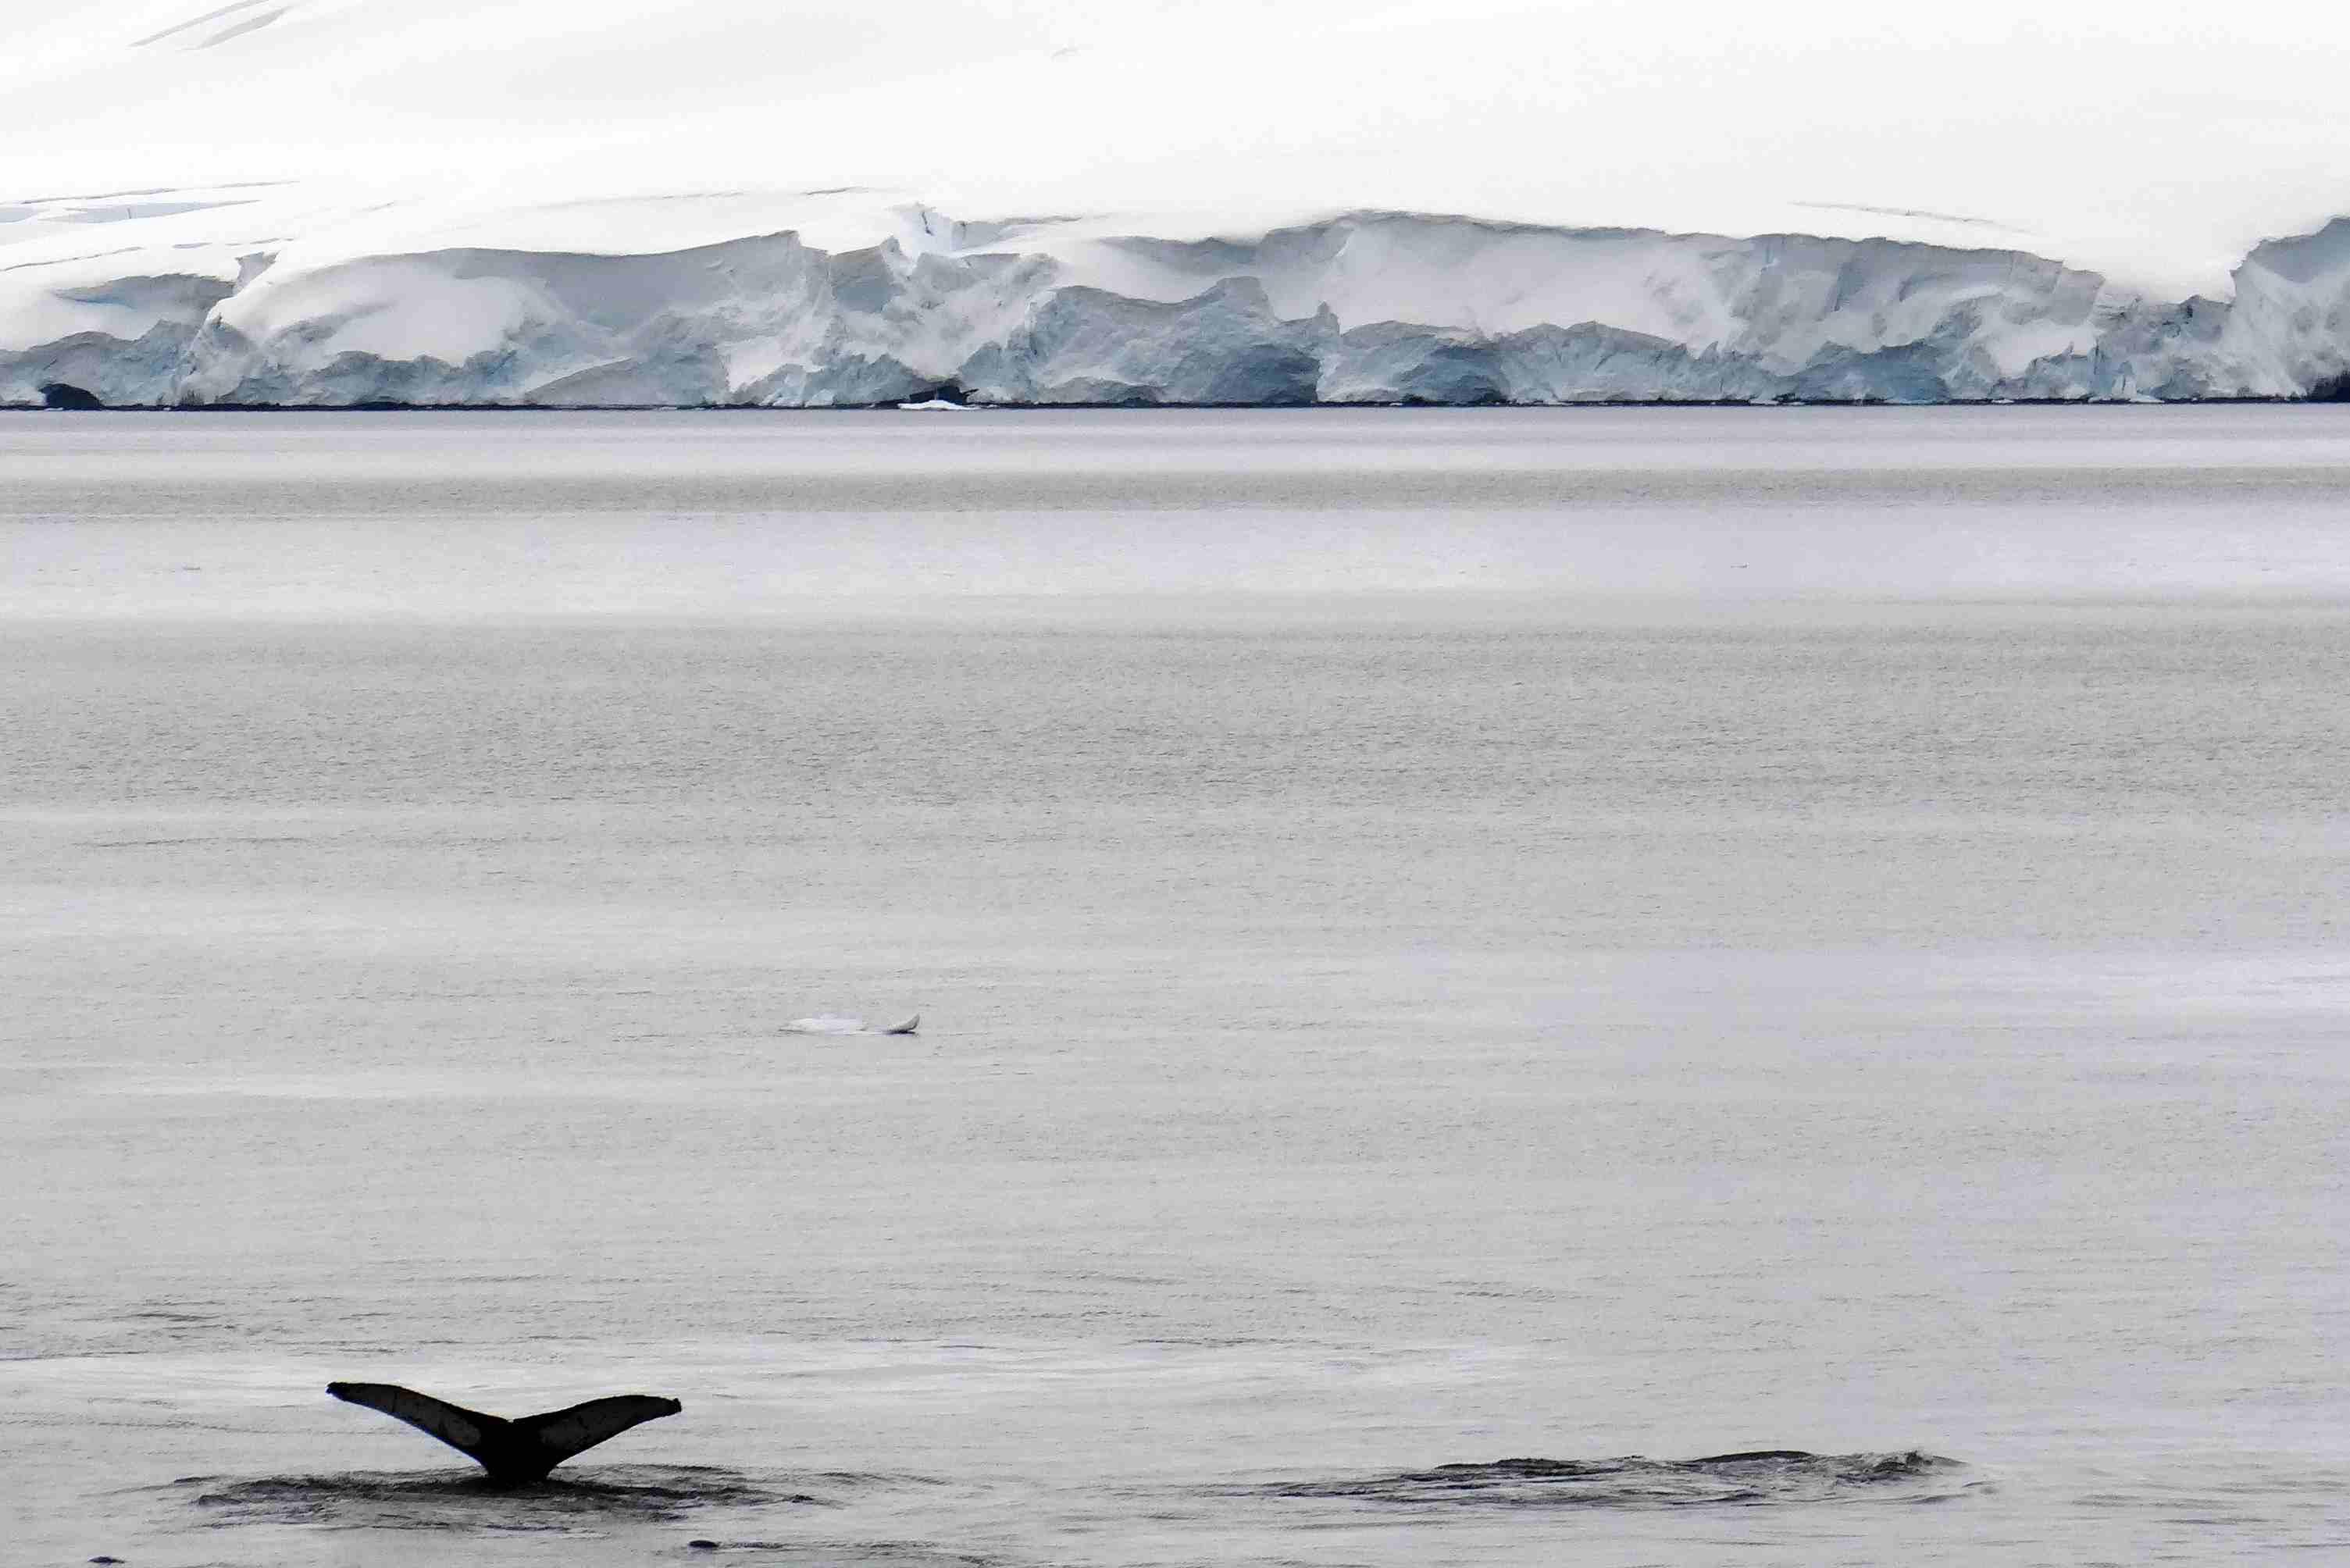 Whales in Wilhelmina Bay, Antarctica